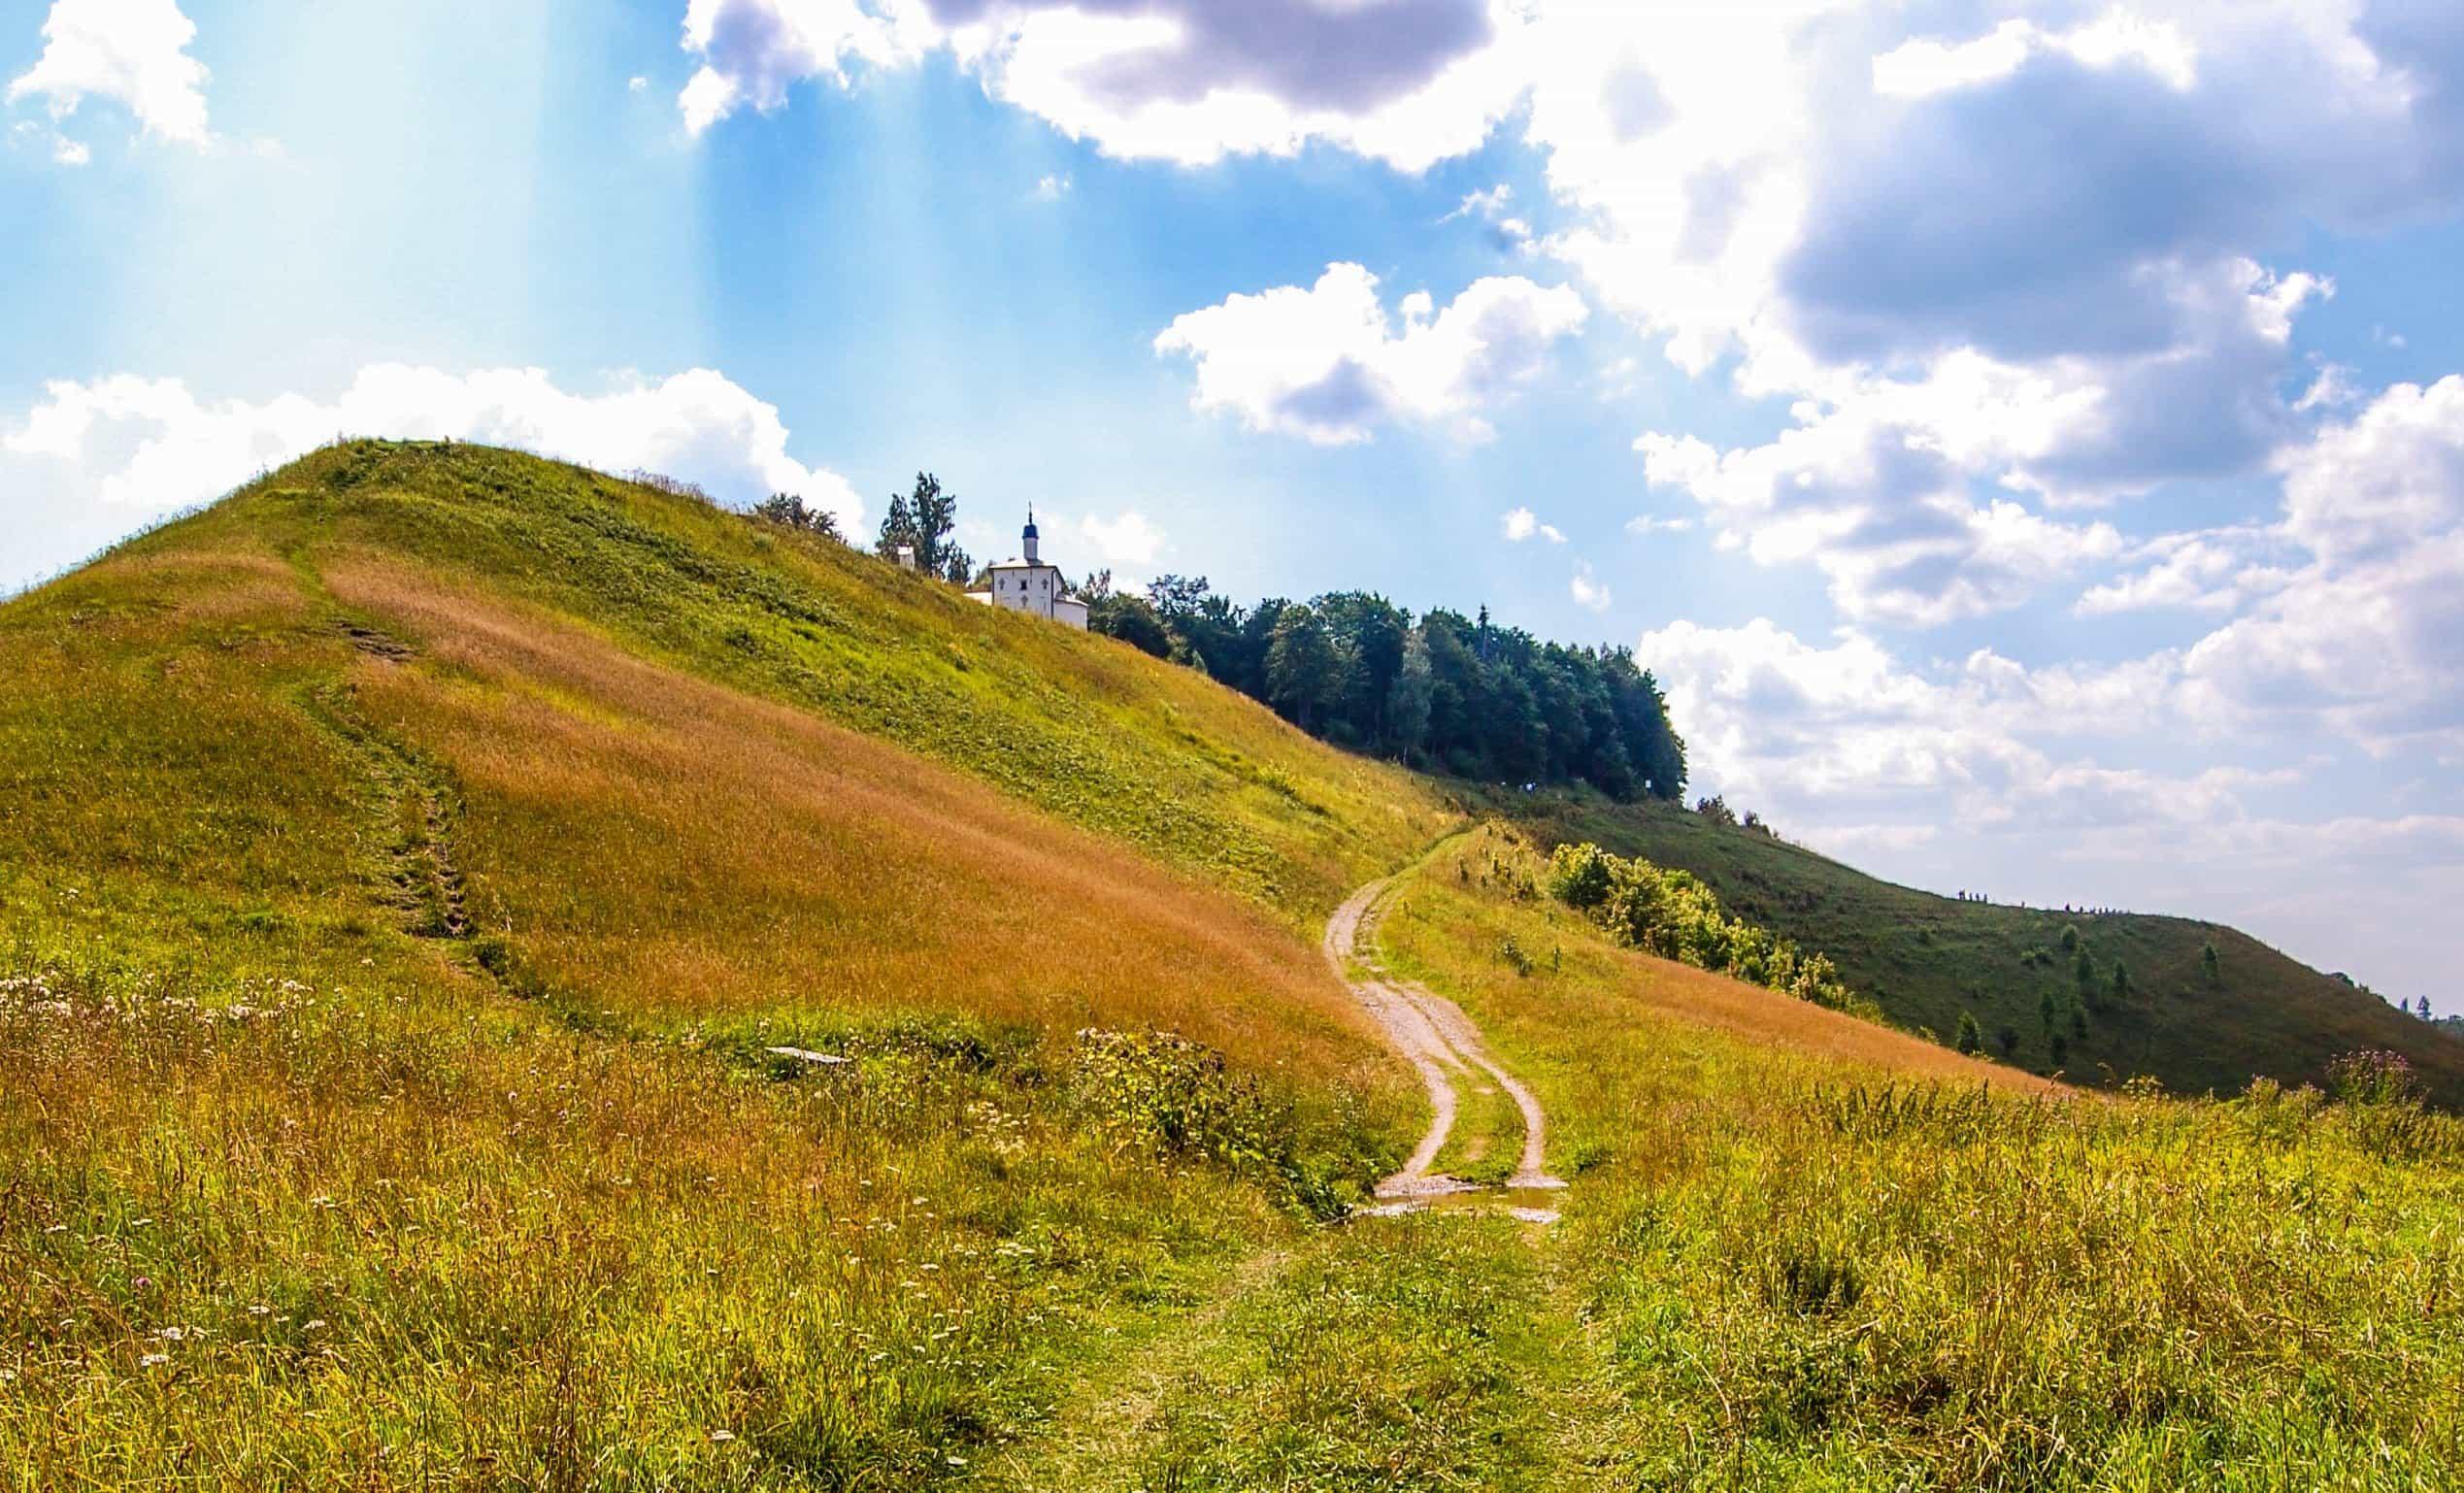 free picture landscape nature grass hill sky field rural